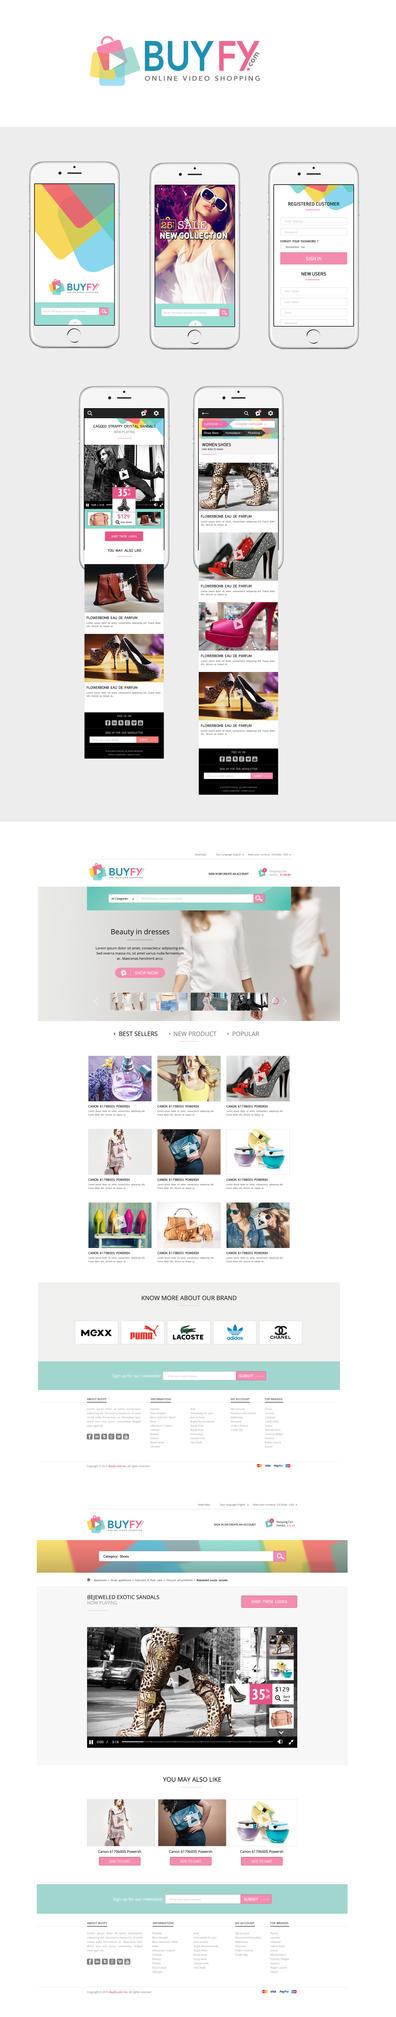 Buyfy by Webdesignerps